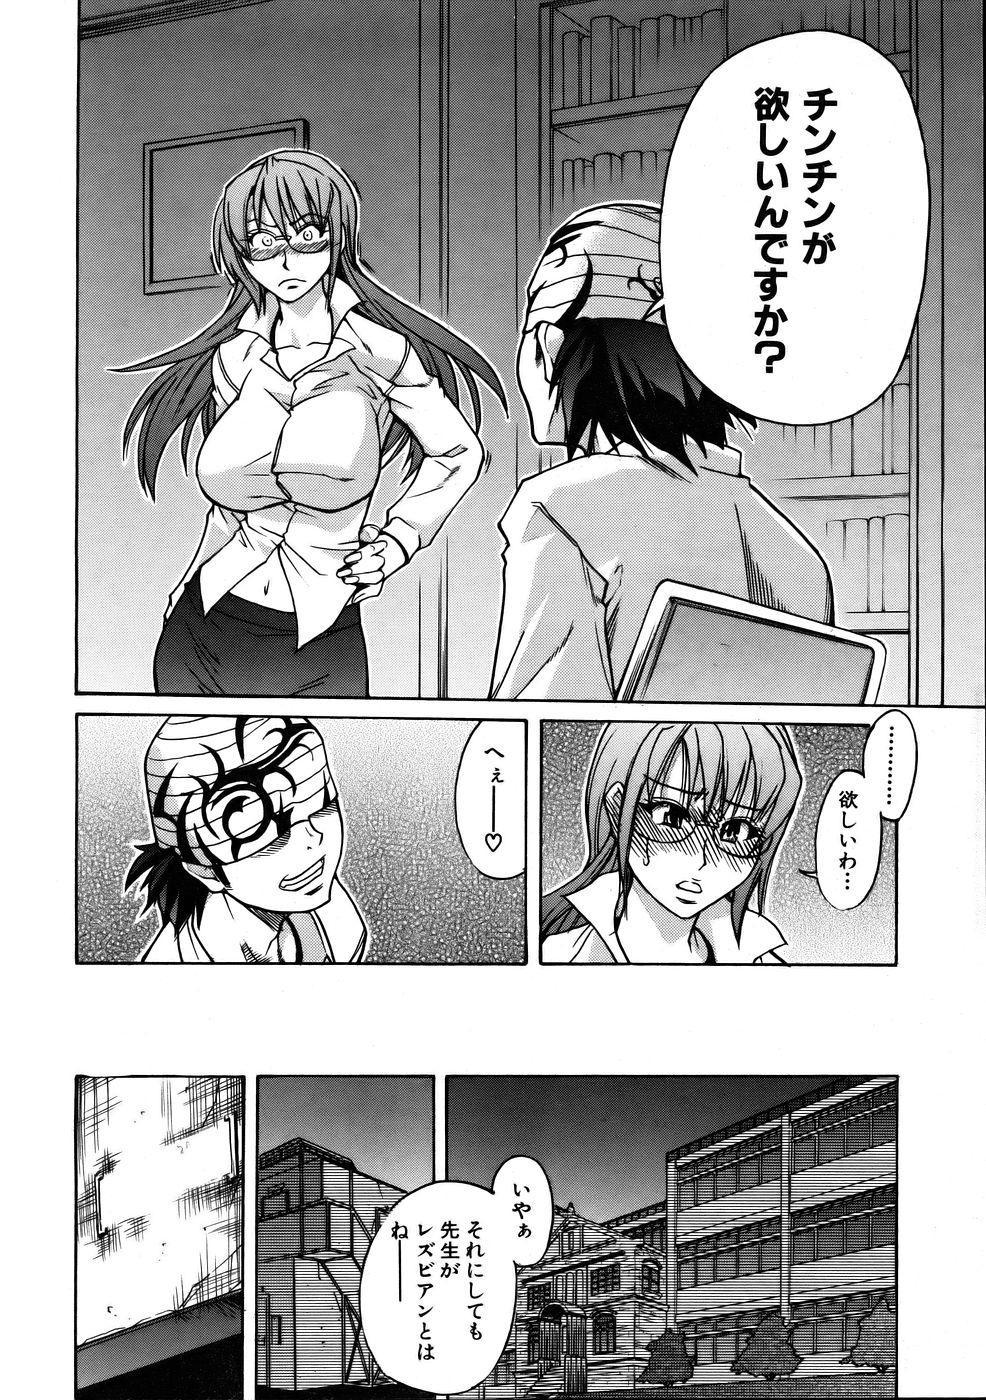 COMIC AUN 2005-10 Vol. 113 17